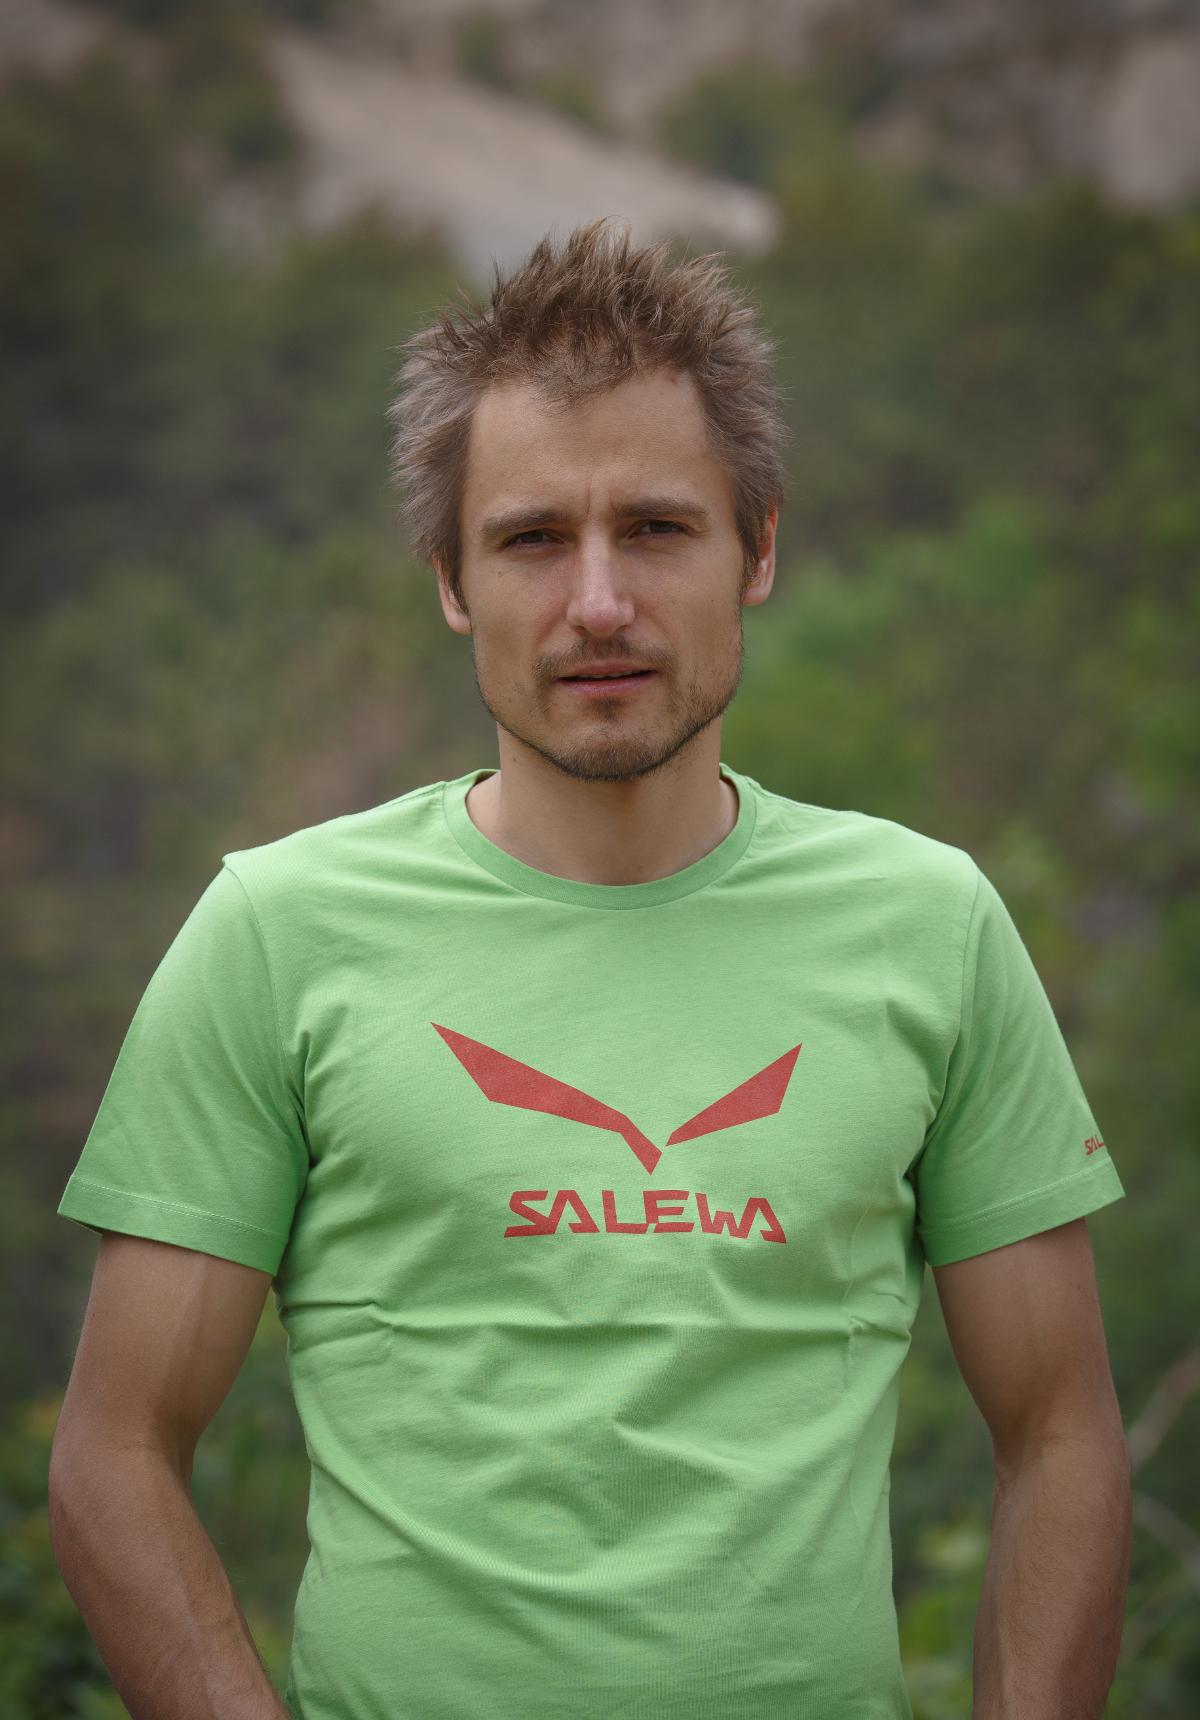 Łukasz Dudek (fot. Jacek Matuszek)